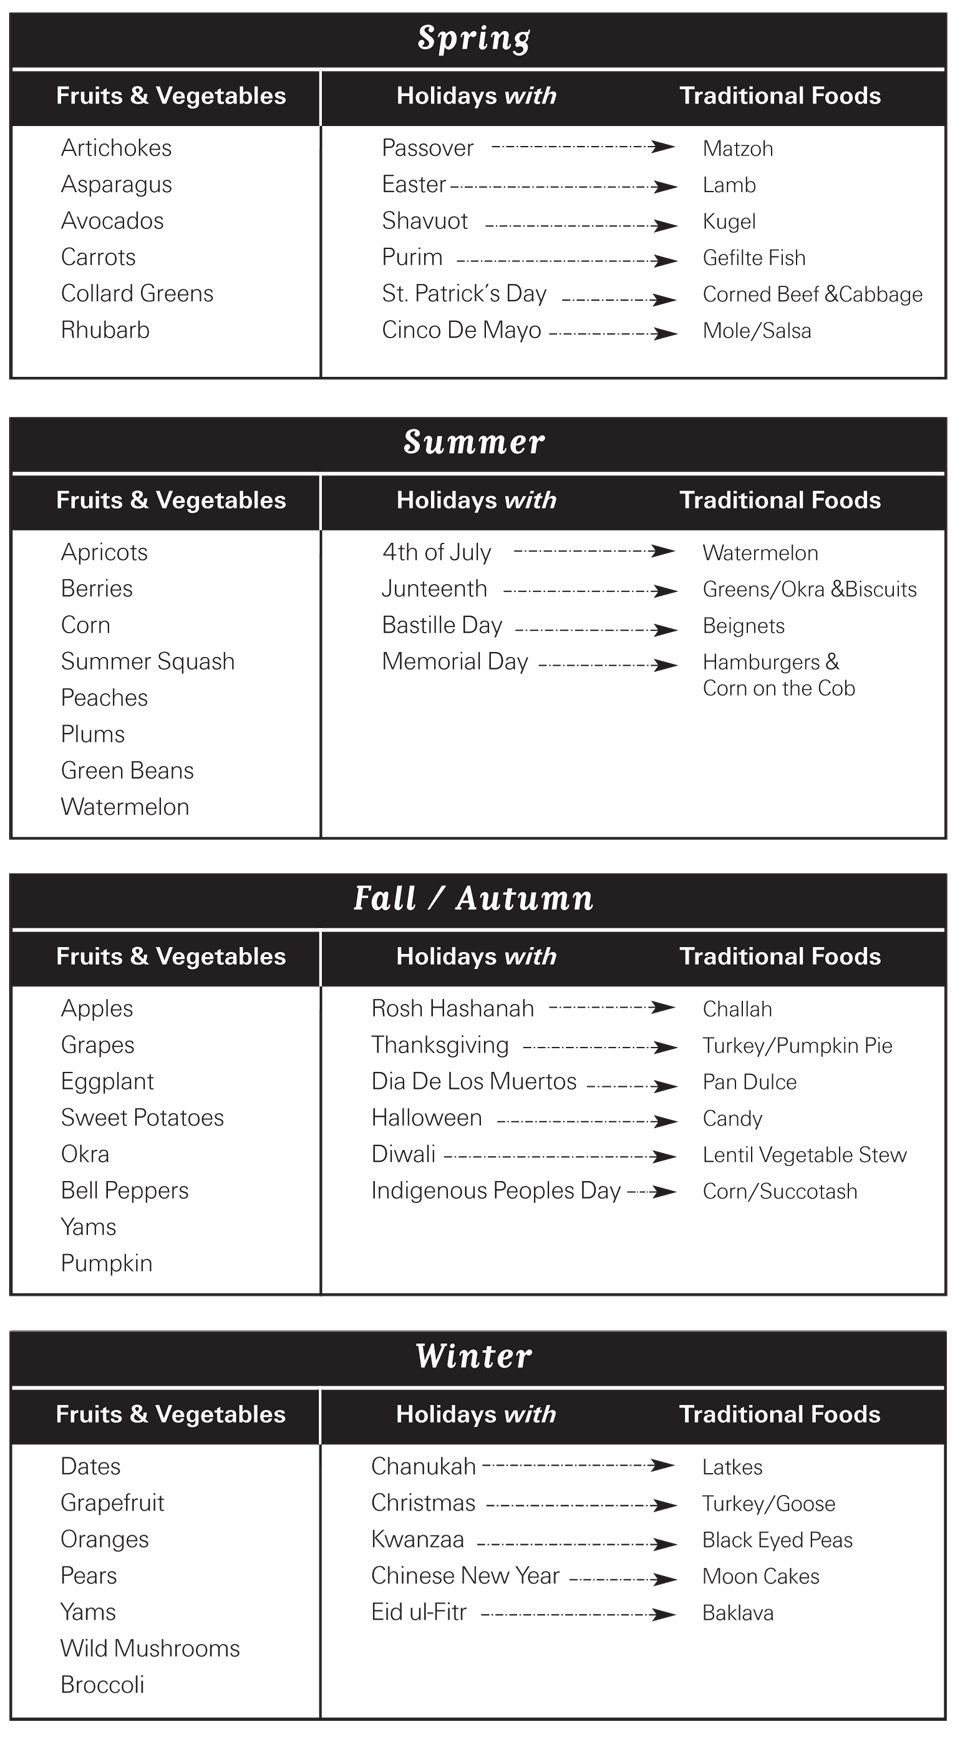 Fruits, veggies & holidays season